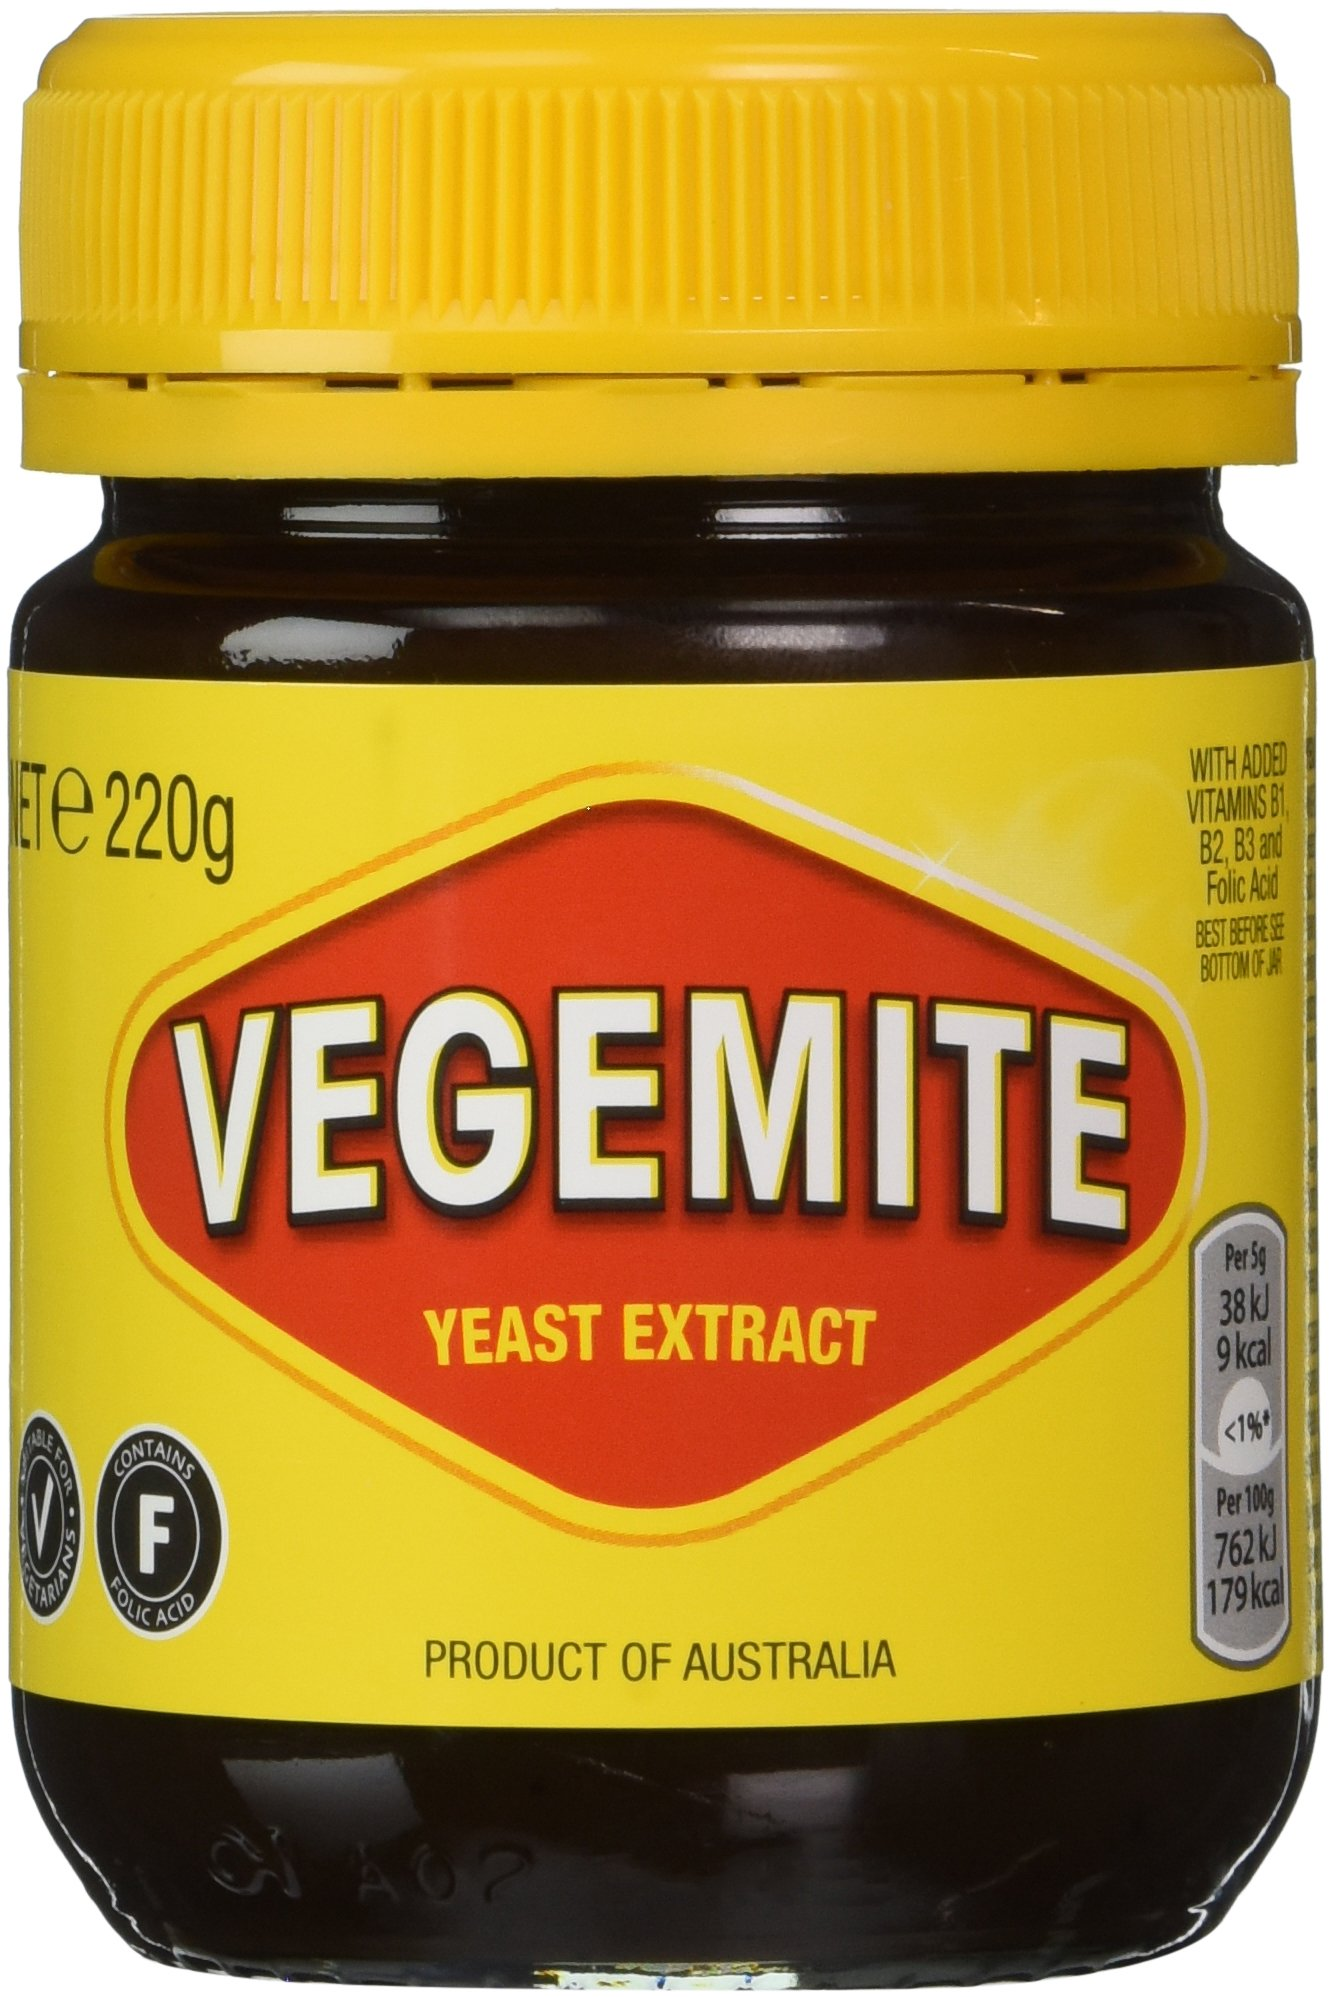 Vegemite 220g - Two Pack, with Amazon Prime, Australian Import